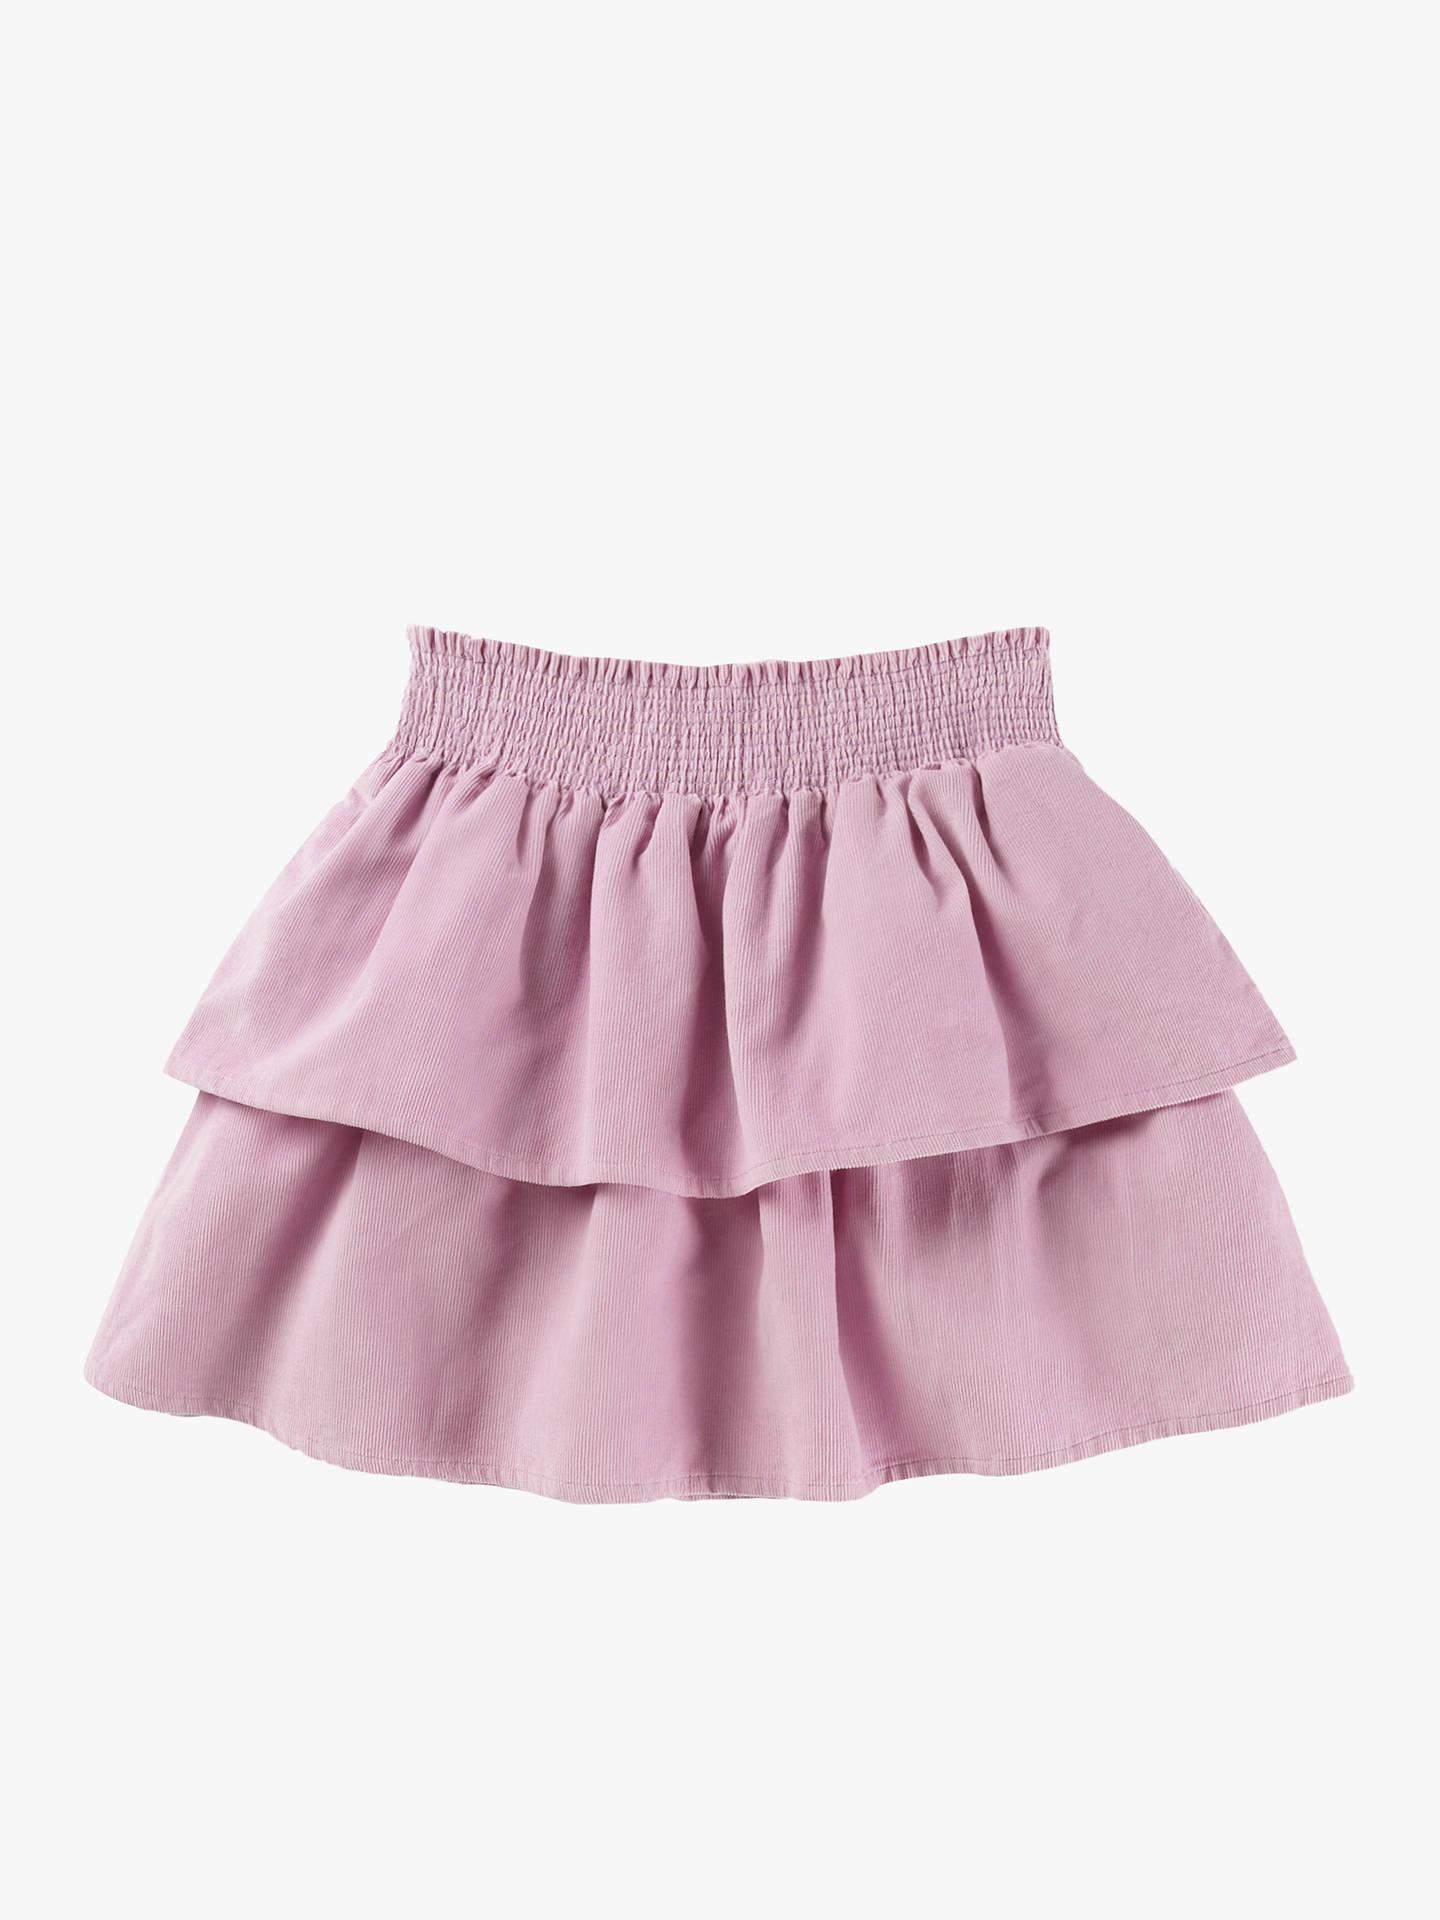 Mini Boden Girls' Ruffle Tiered Skirt, Delphinium Lilac at John Lewis &  Partners